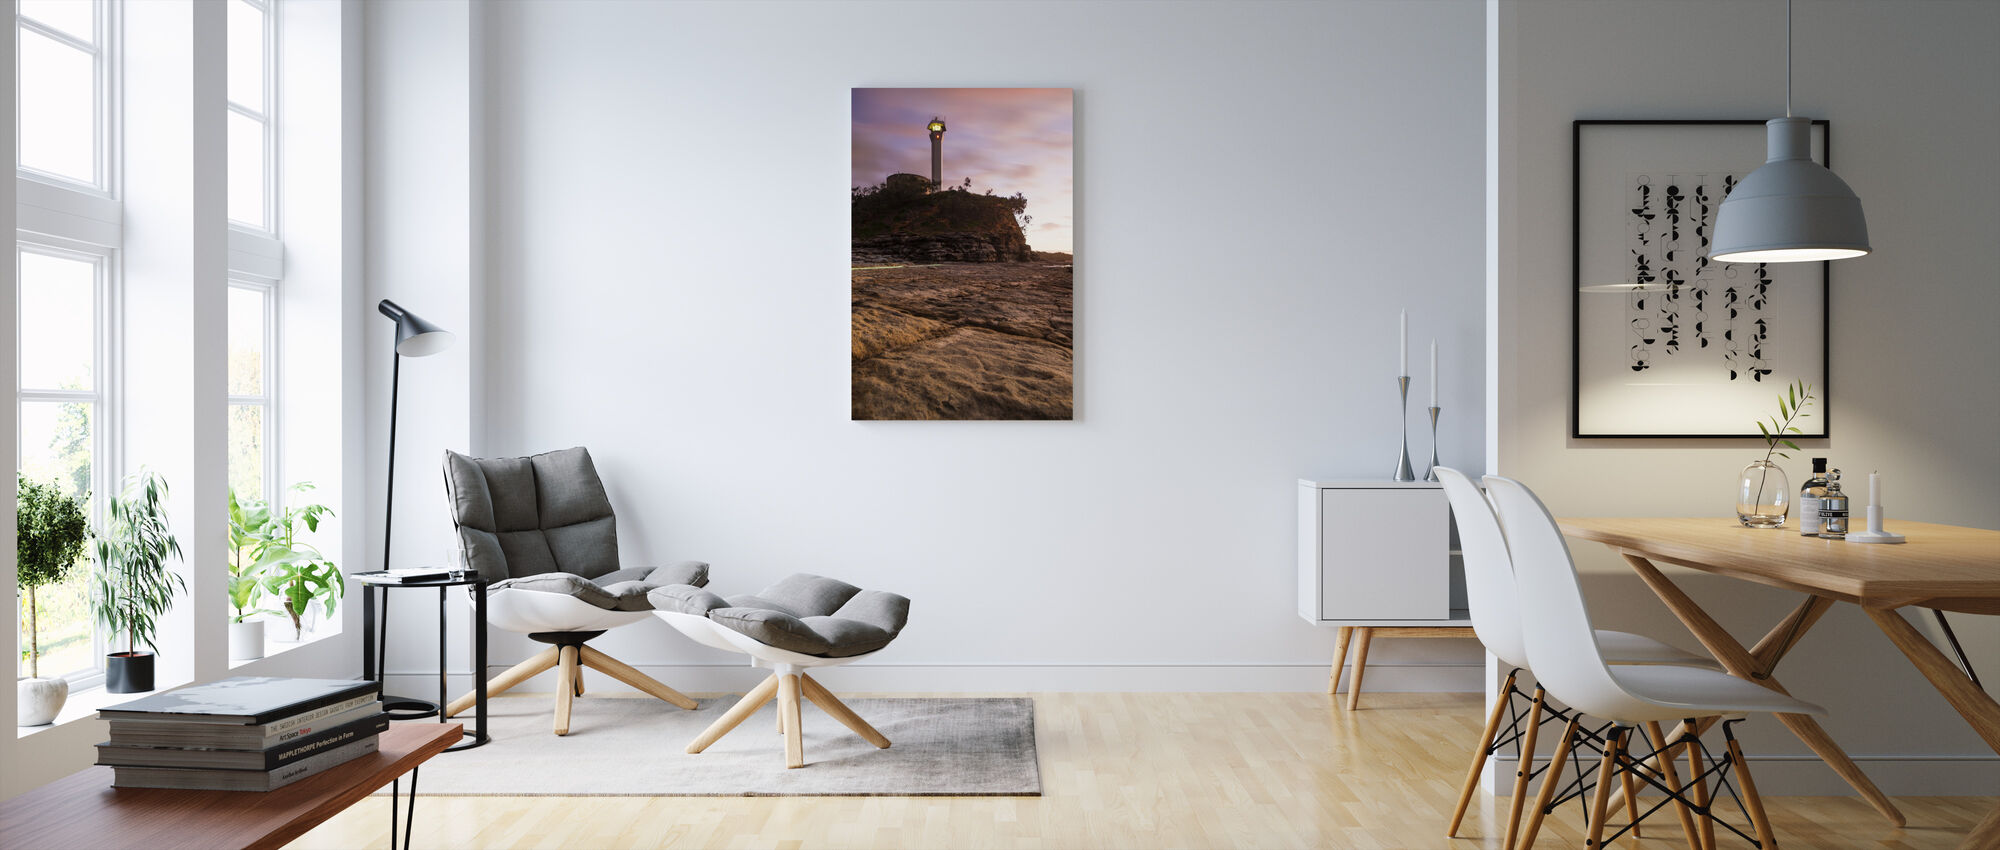 Mooloolaba Vuurtoren, Australië - Canvas print - Woonkamer